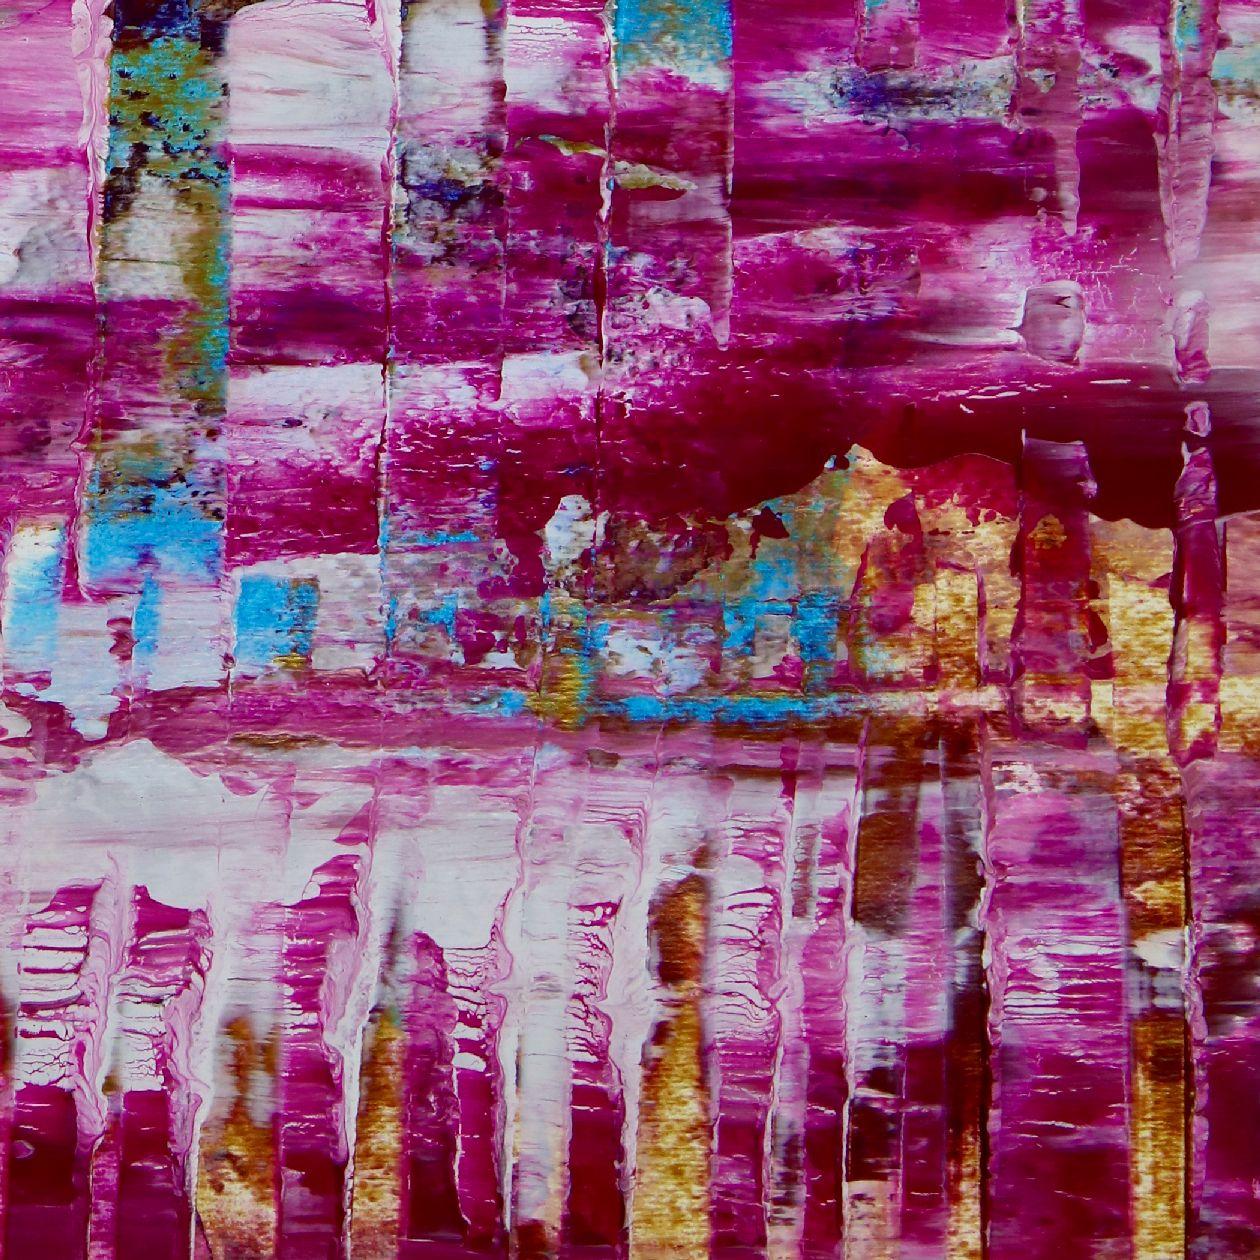 Dreams in Pink by Nestor Toro - Los Angeles